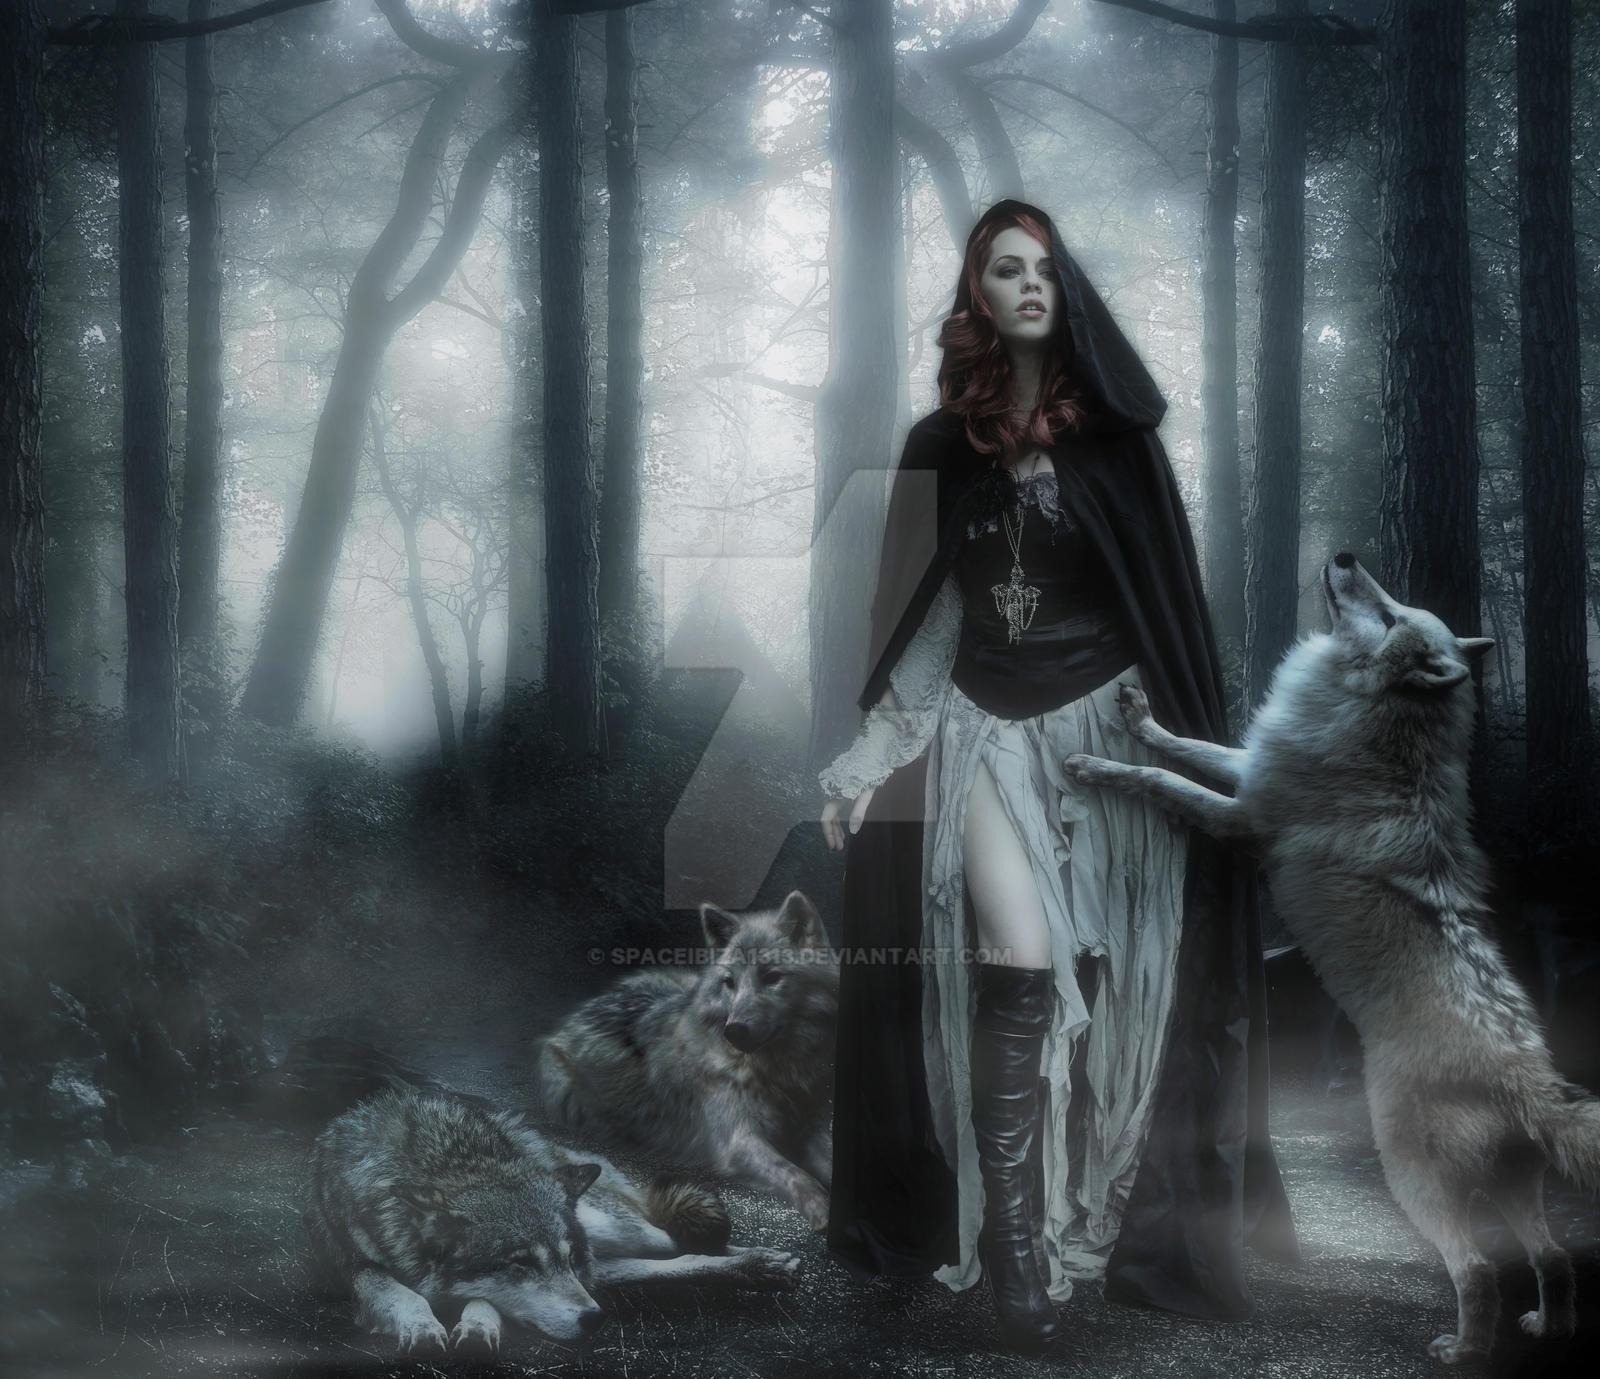 Šta je pisac hteo da kaže? - Majacvet - Page 3 Dances_with_wolves____by_spaceibiza1313-d5gkb61